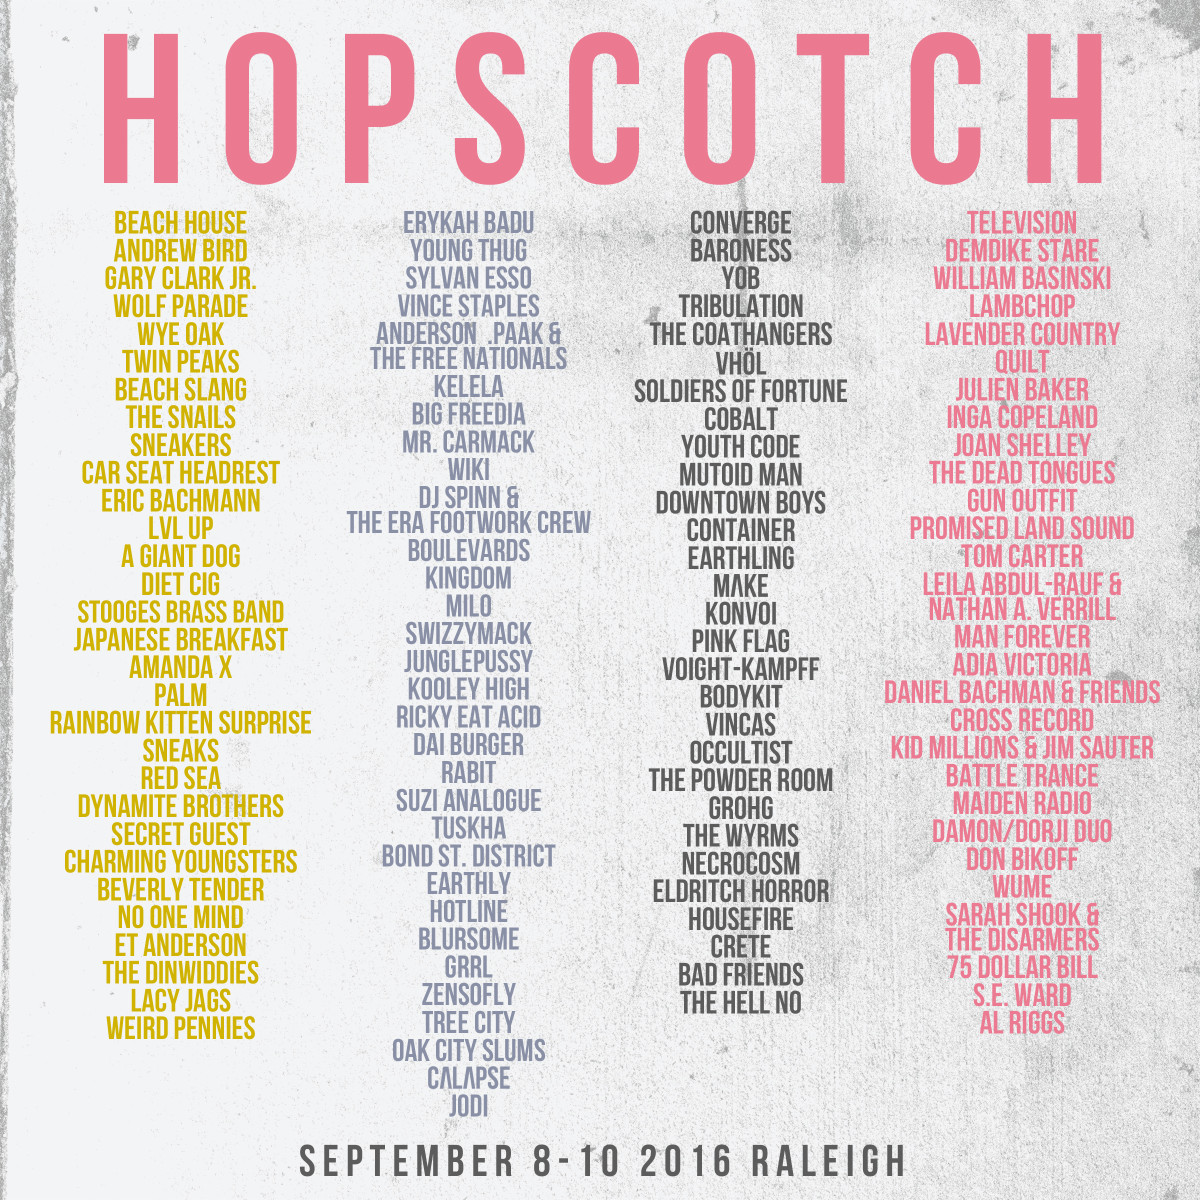 Hopscotch 2016 lineup